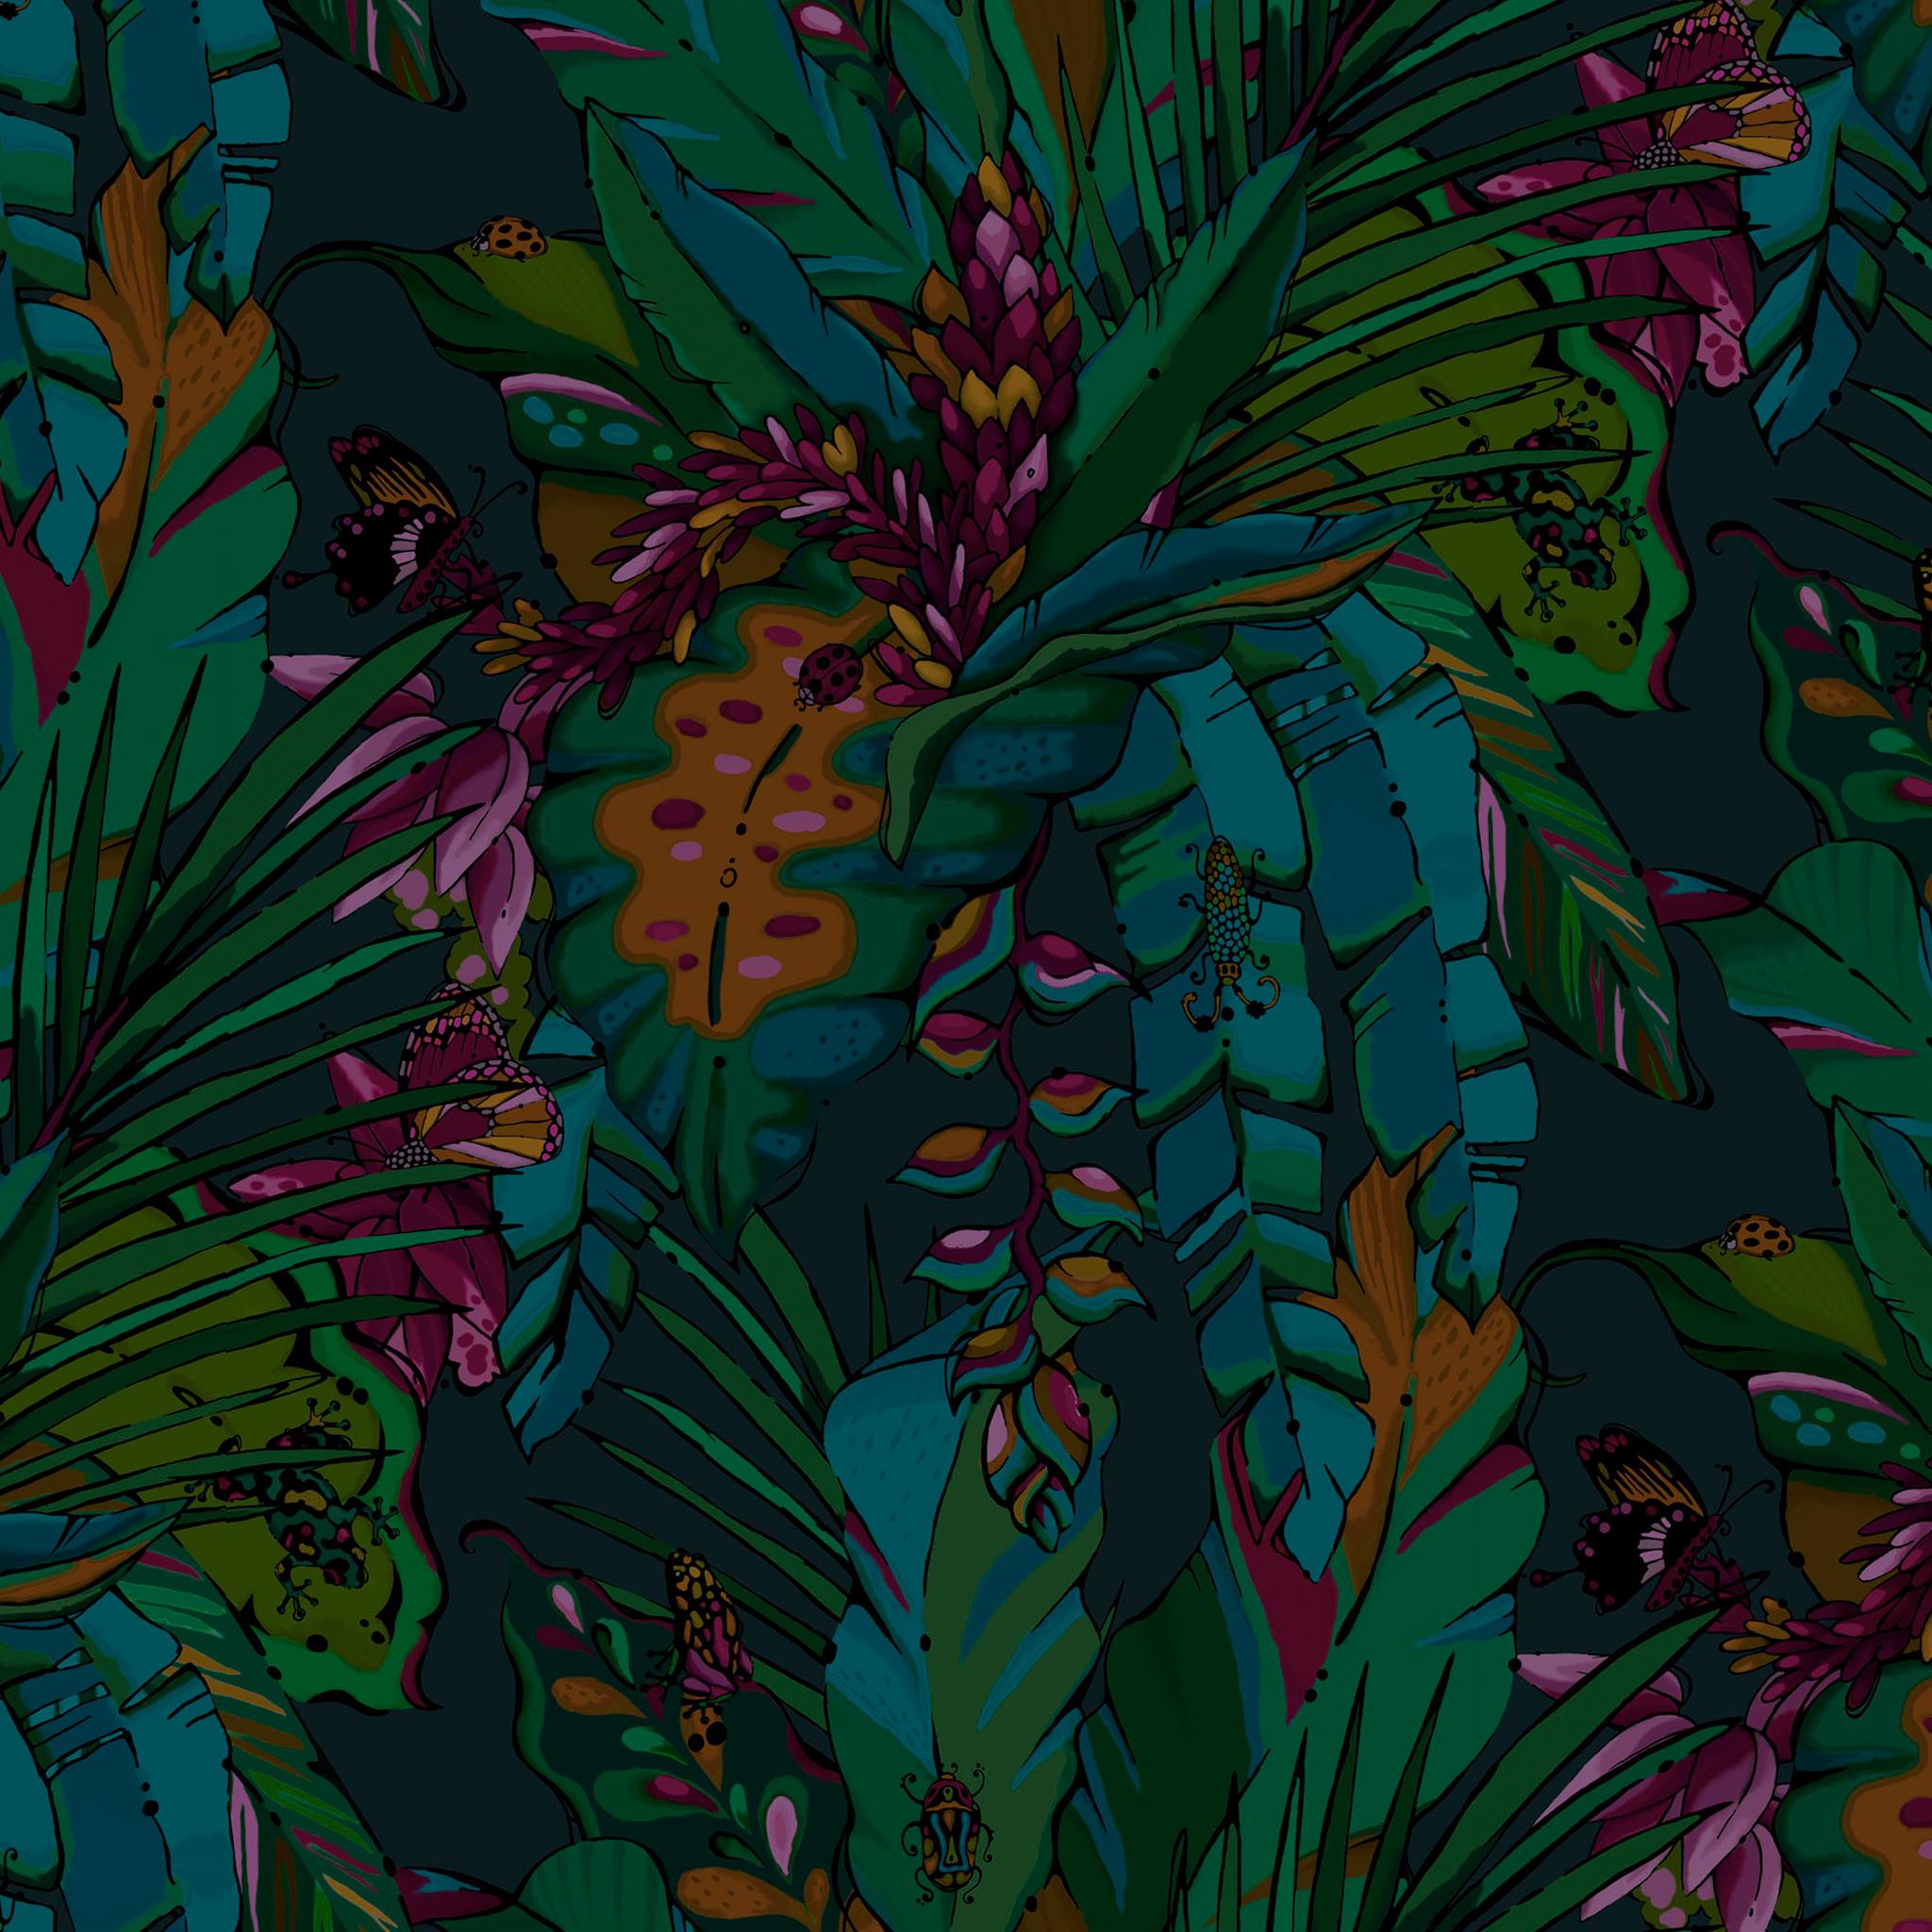 dark tropical wallpaper from aase hopstock